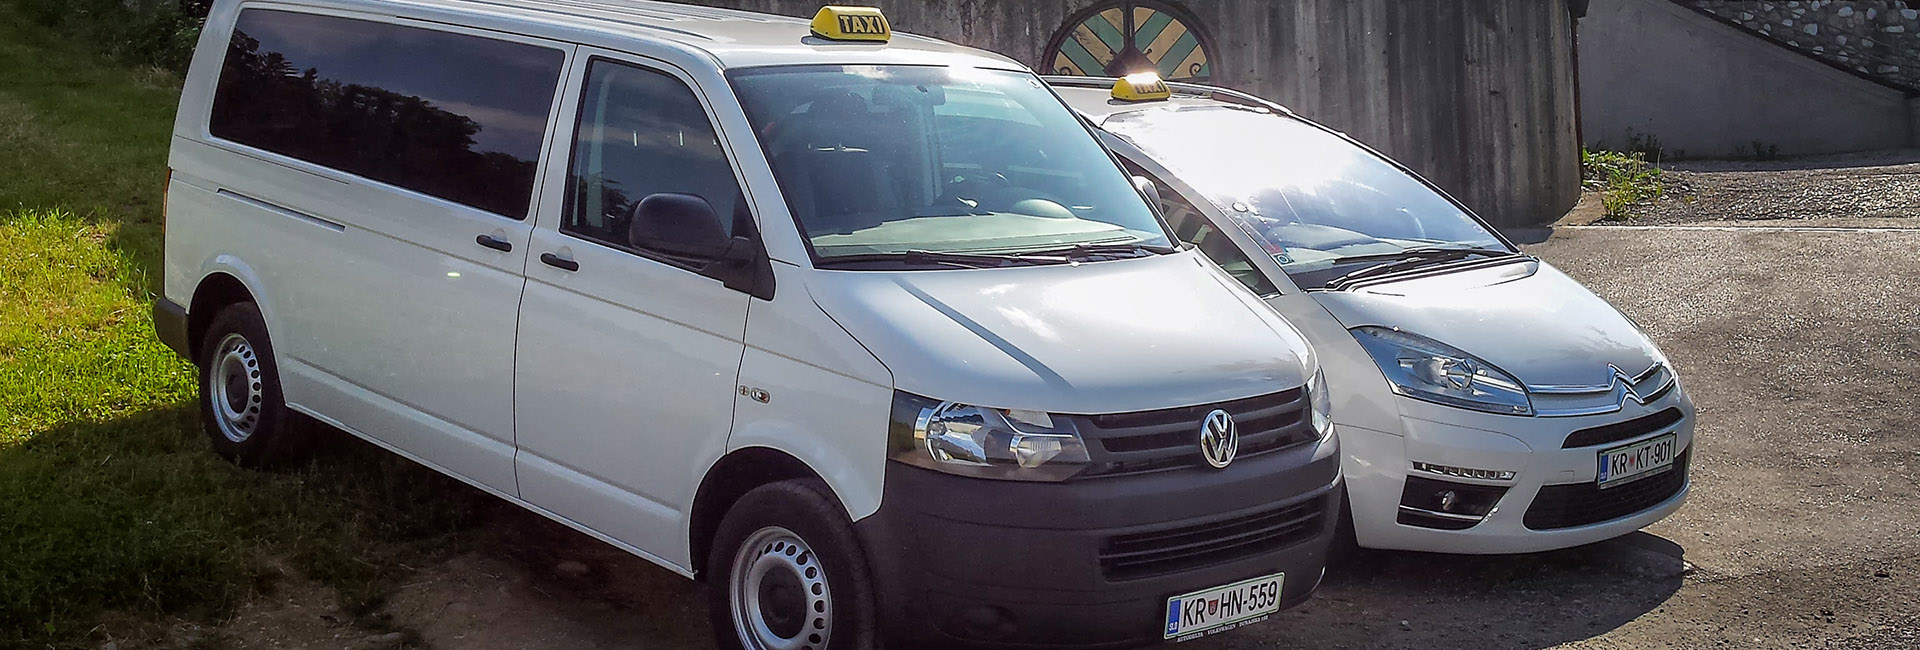 Taxi-AHA-vozni-park_3